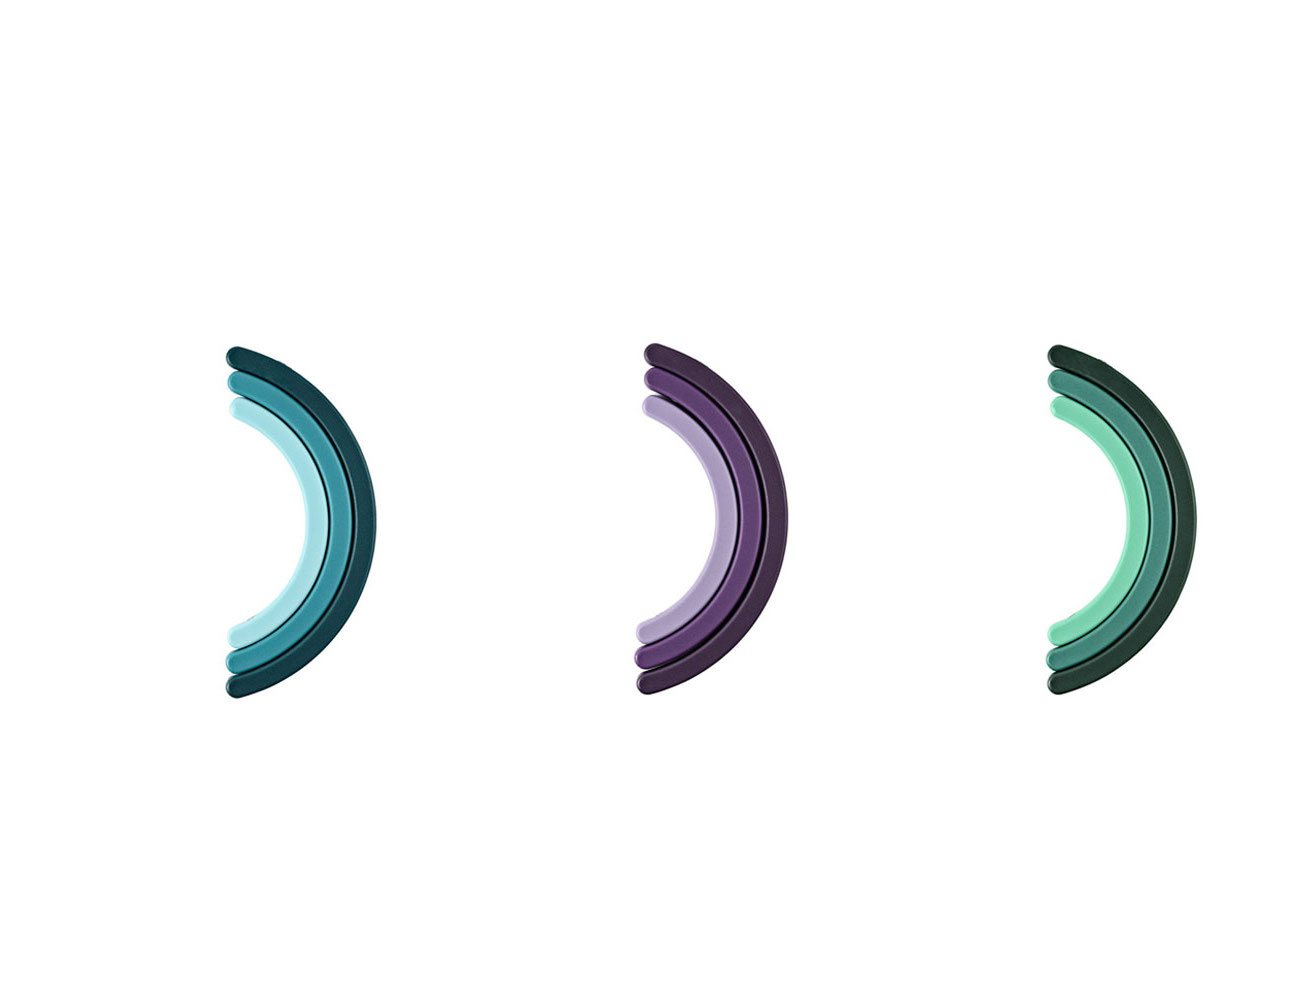 Rainbow Trivet by Normann Copenhagen – With a Foldable Mechanism